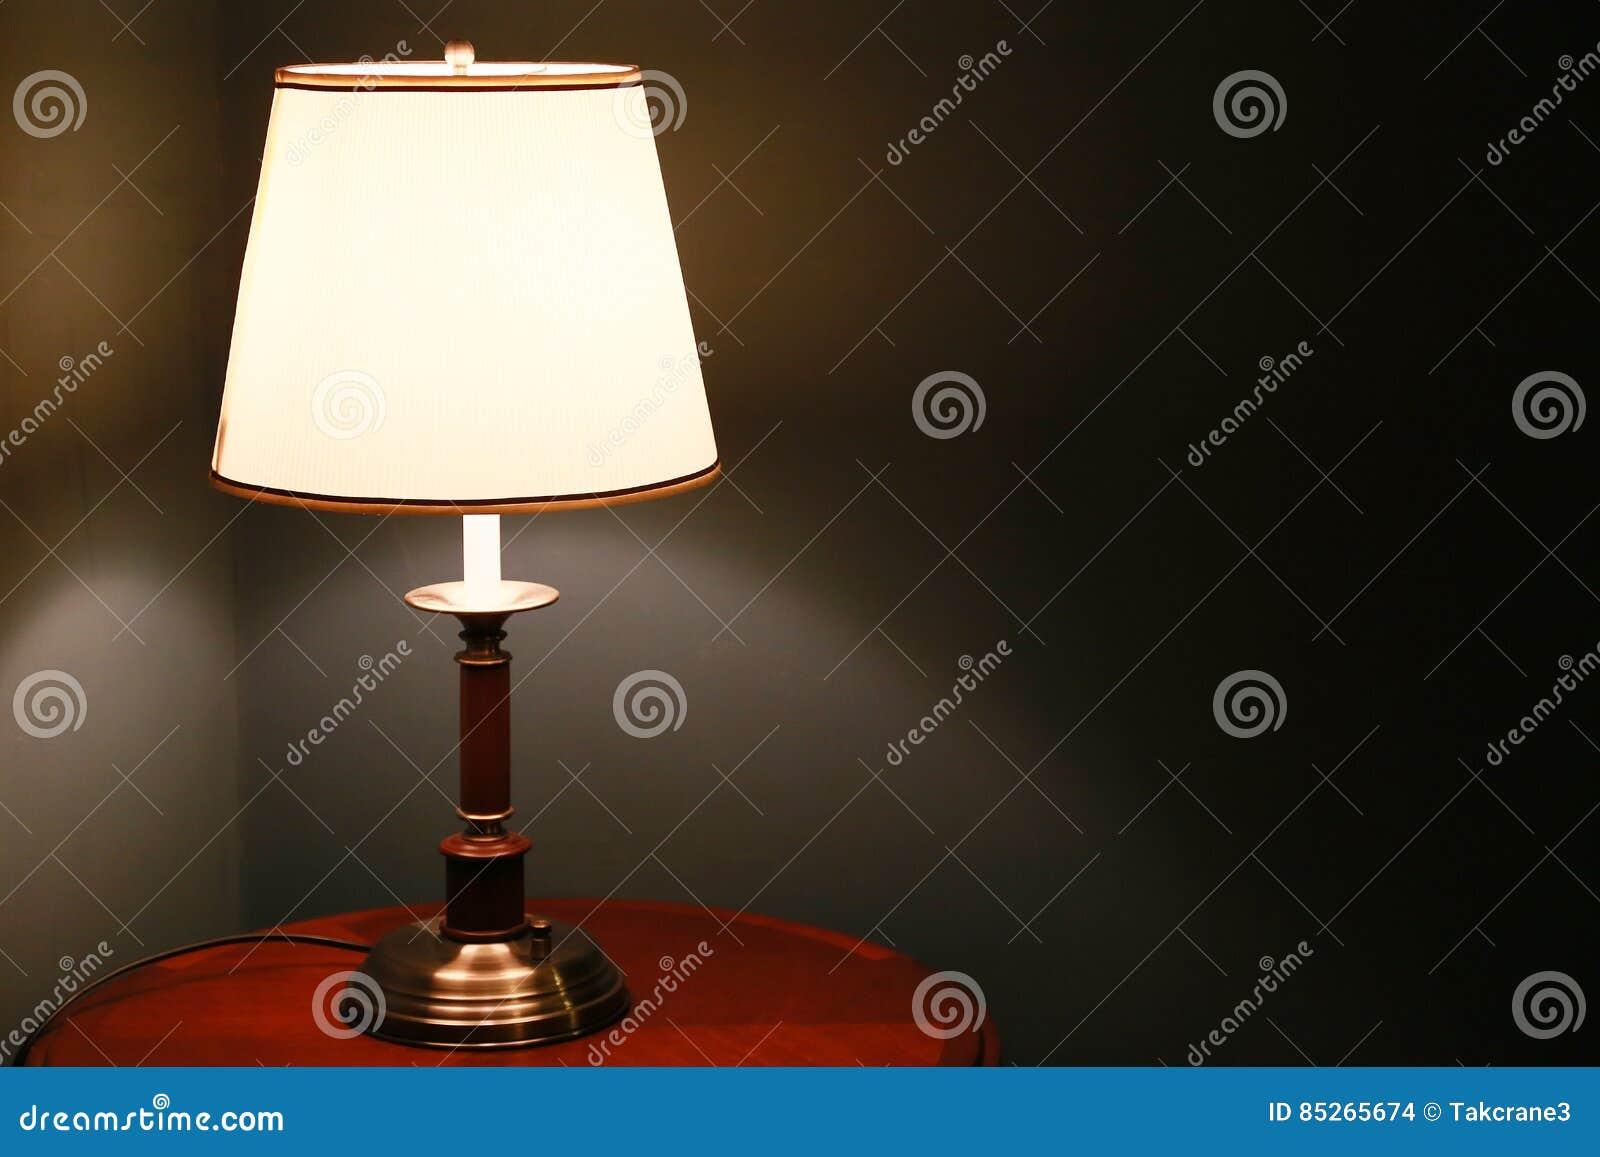 Illumination beside the bed